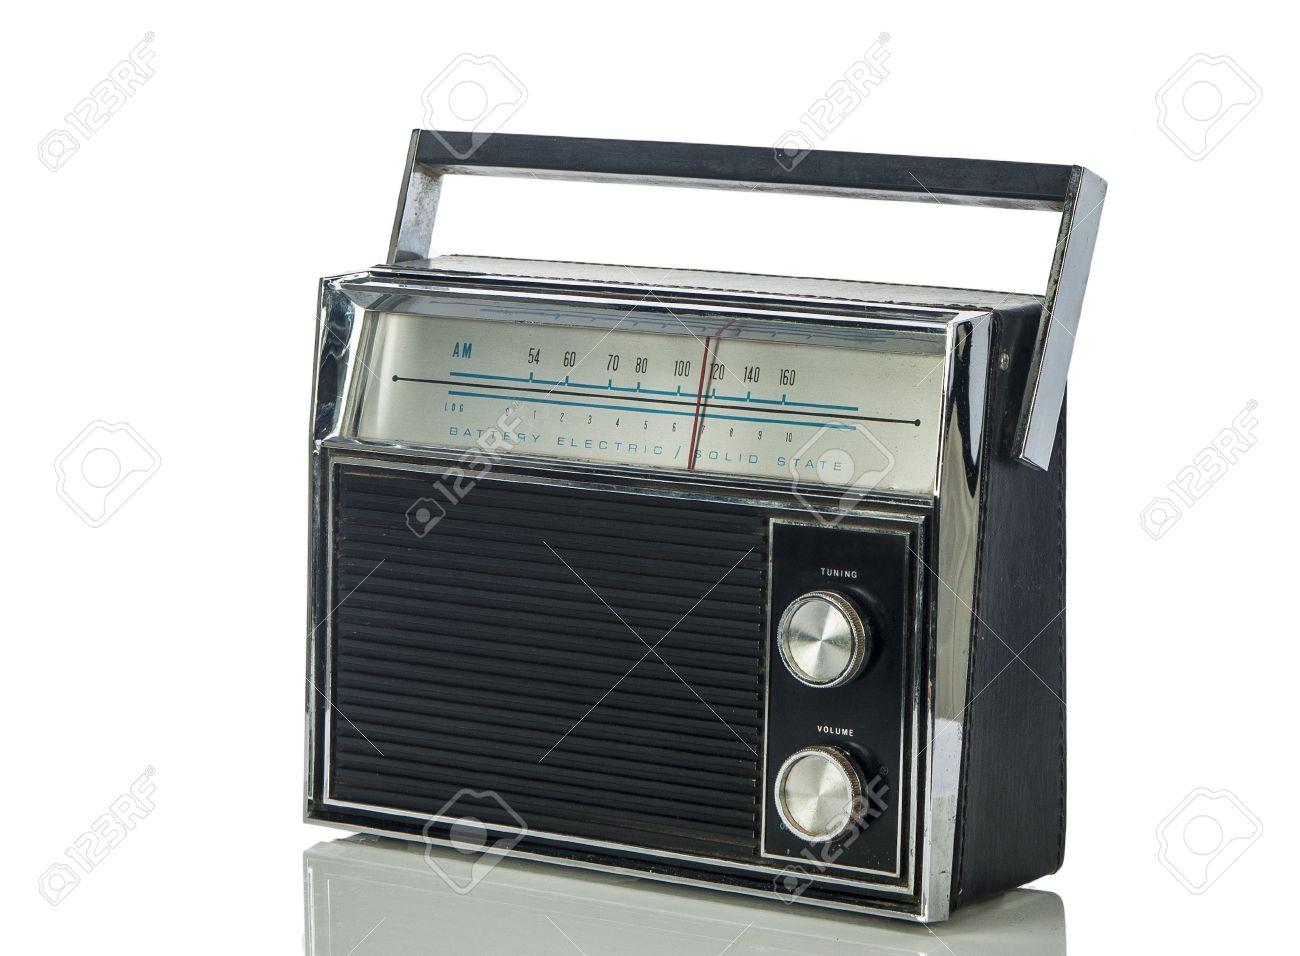 Transistor radio recommendation